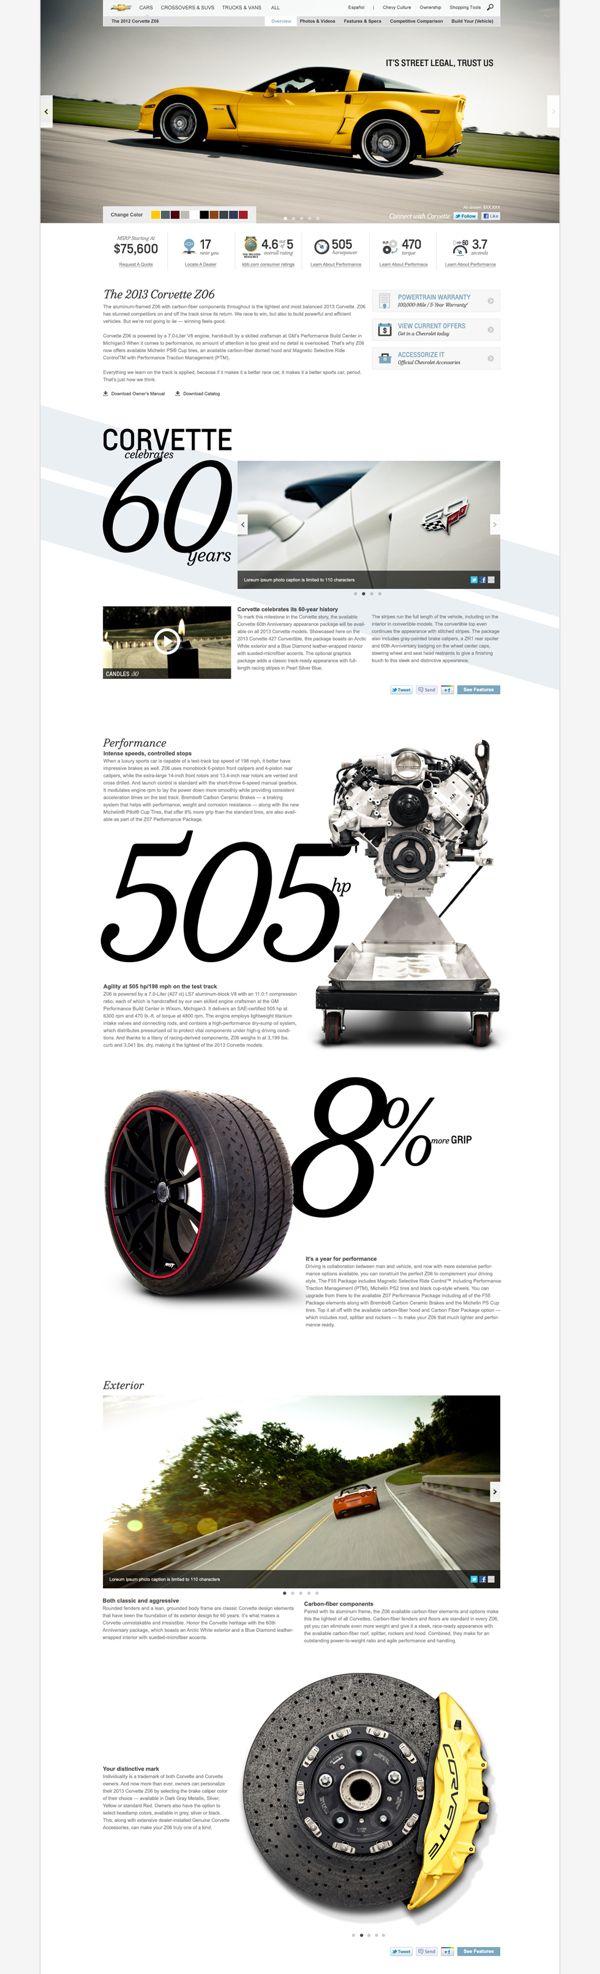 chevy.com by Lauren Totman, via #Behance #webdesign